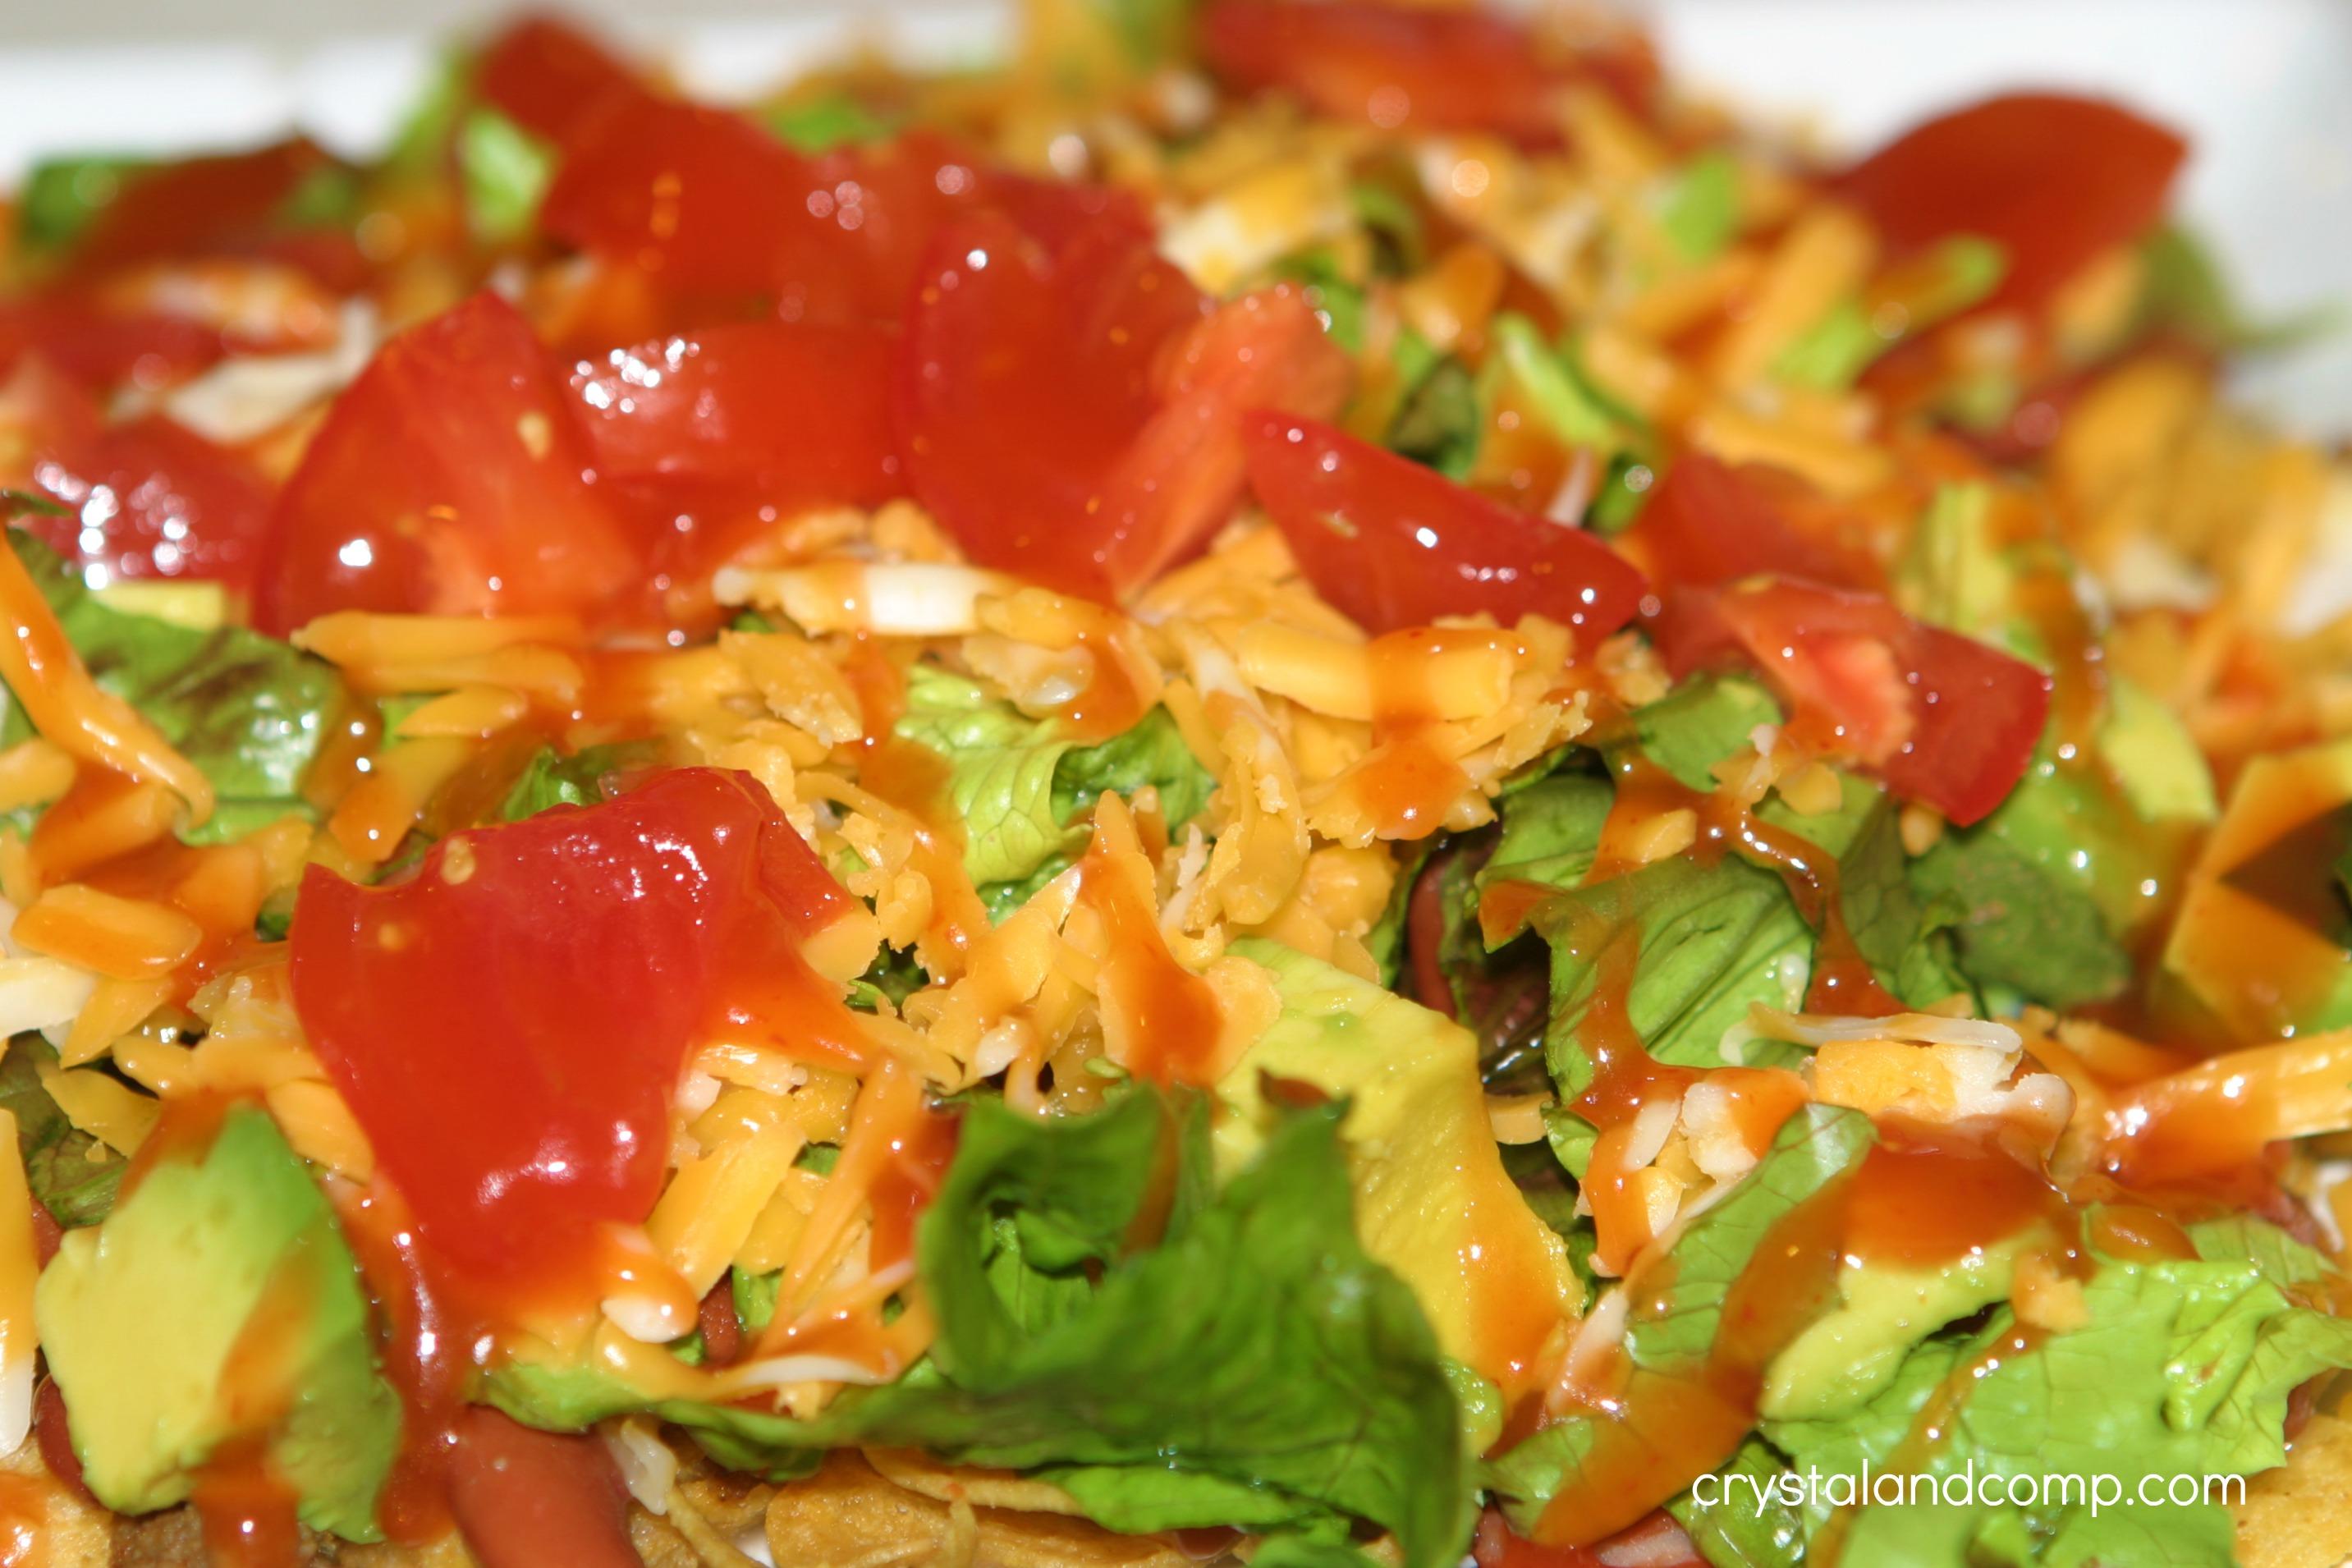 Easy Taco Salad (30 Minute Meal) | CrystalandComp.com